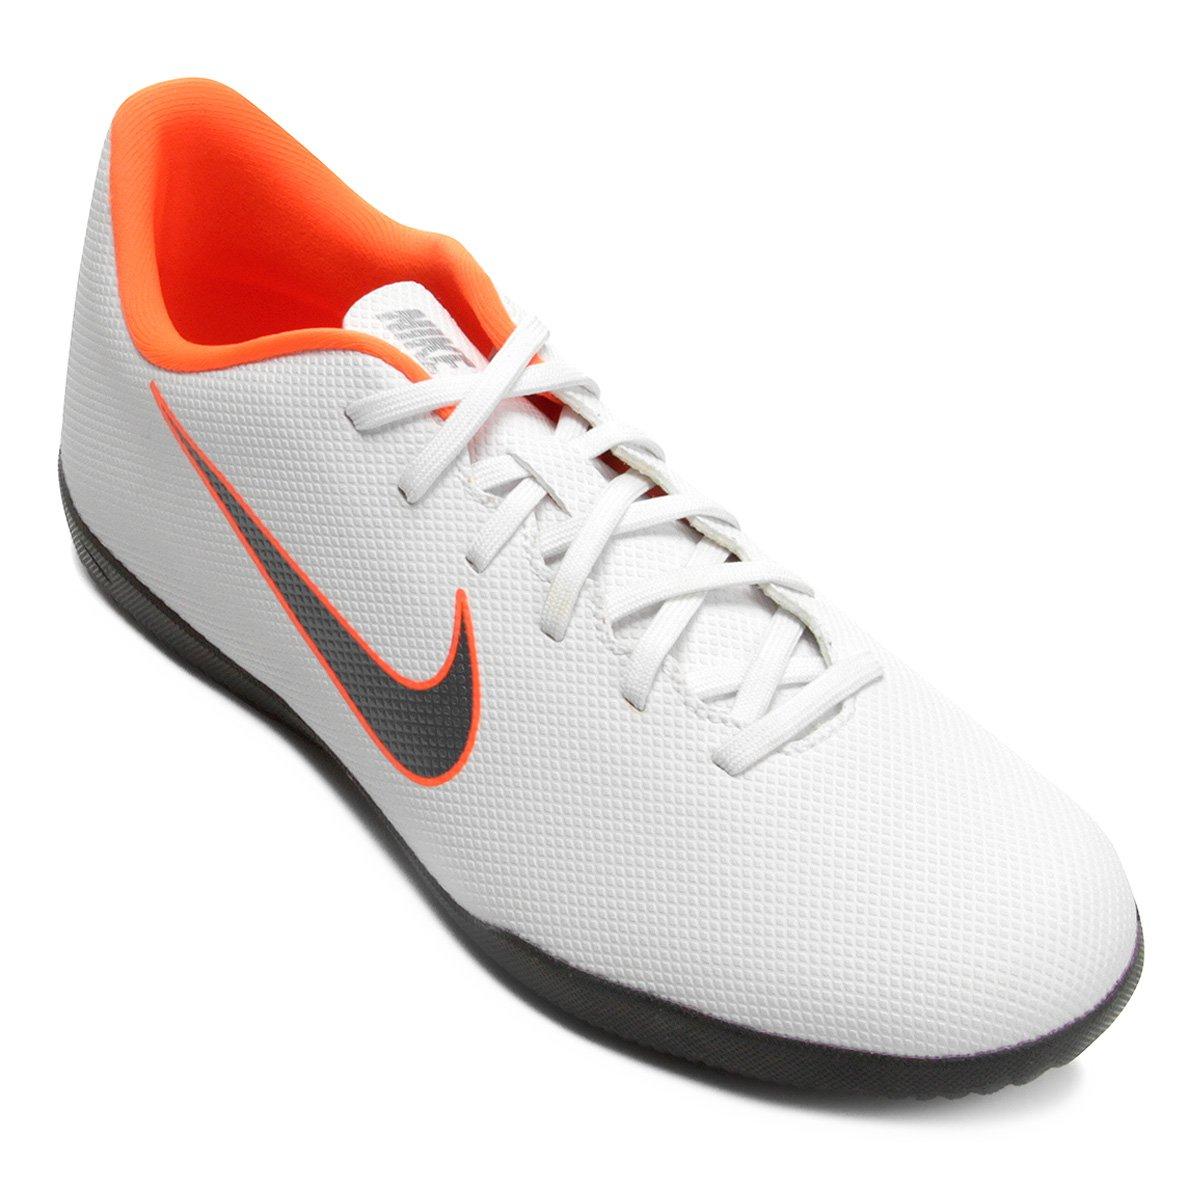 Chuteira Futsal Nike Mercurial Vapor 12 Club - Branco e Cinza ... 3105158f0e179